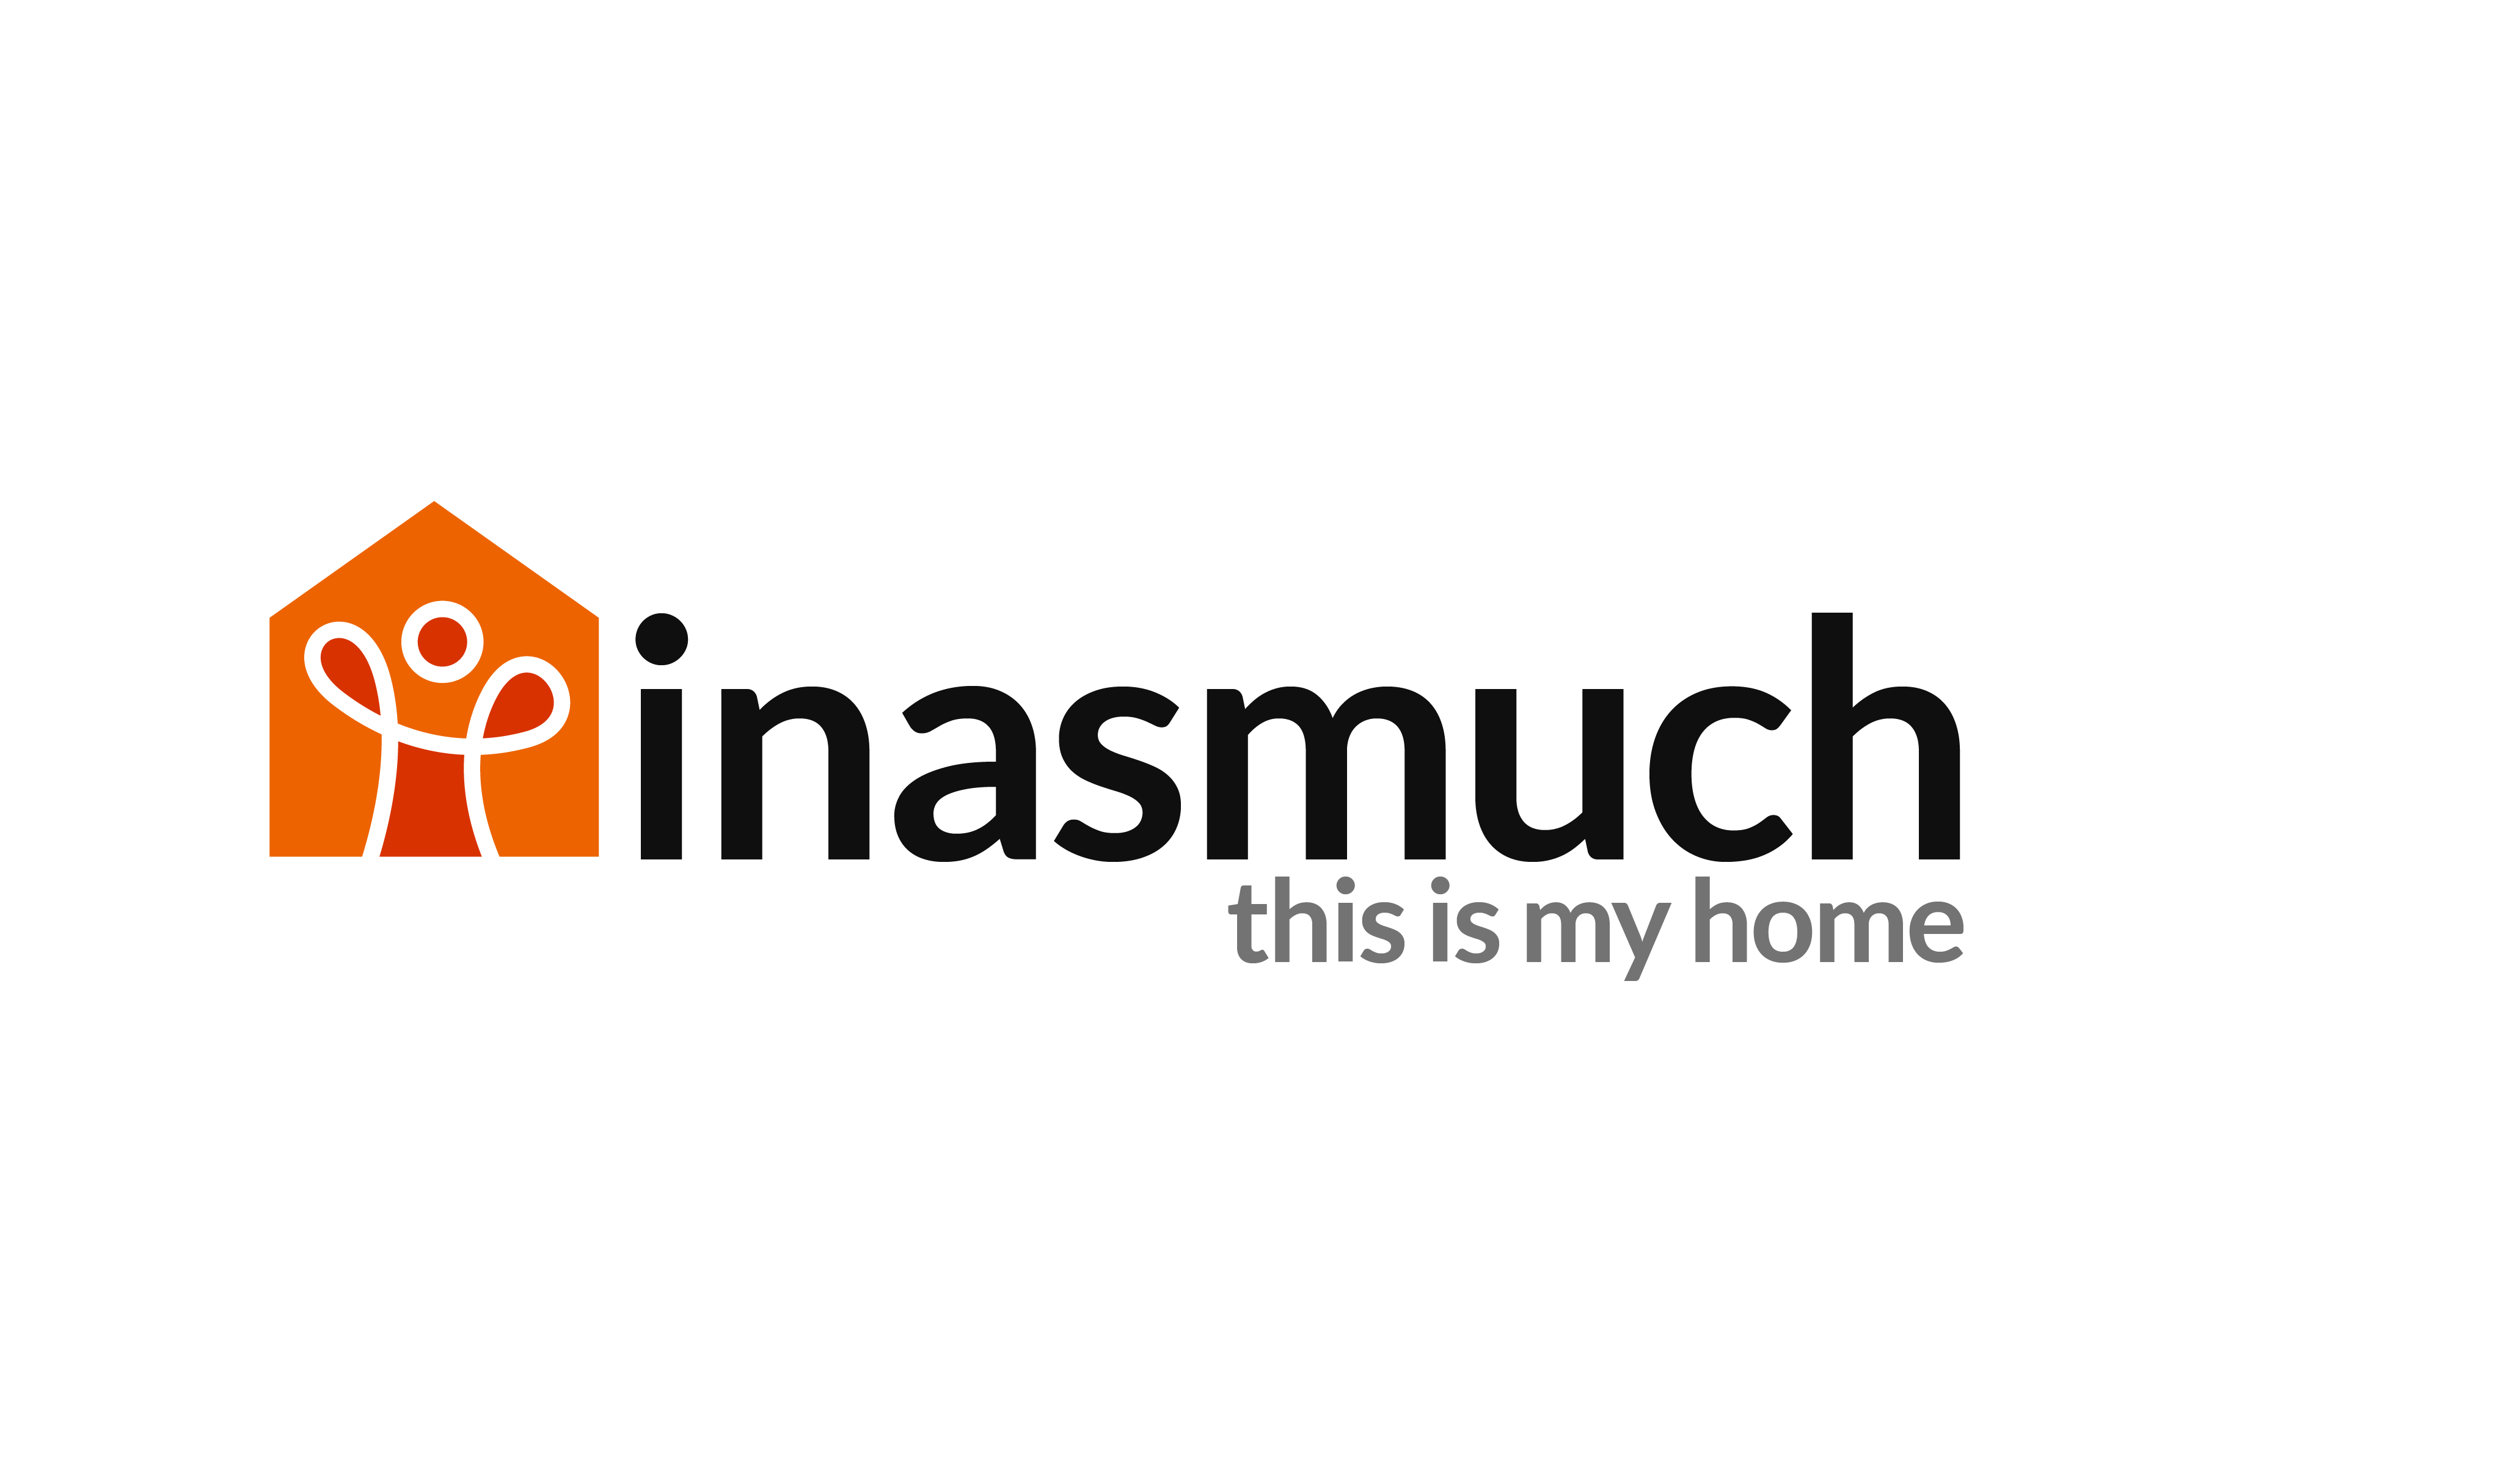 Inasmuch